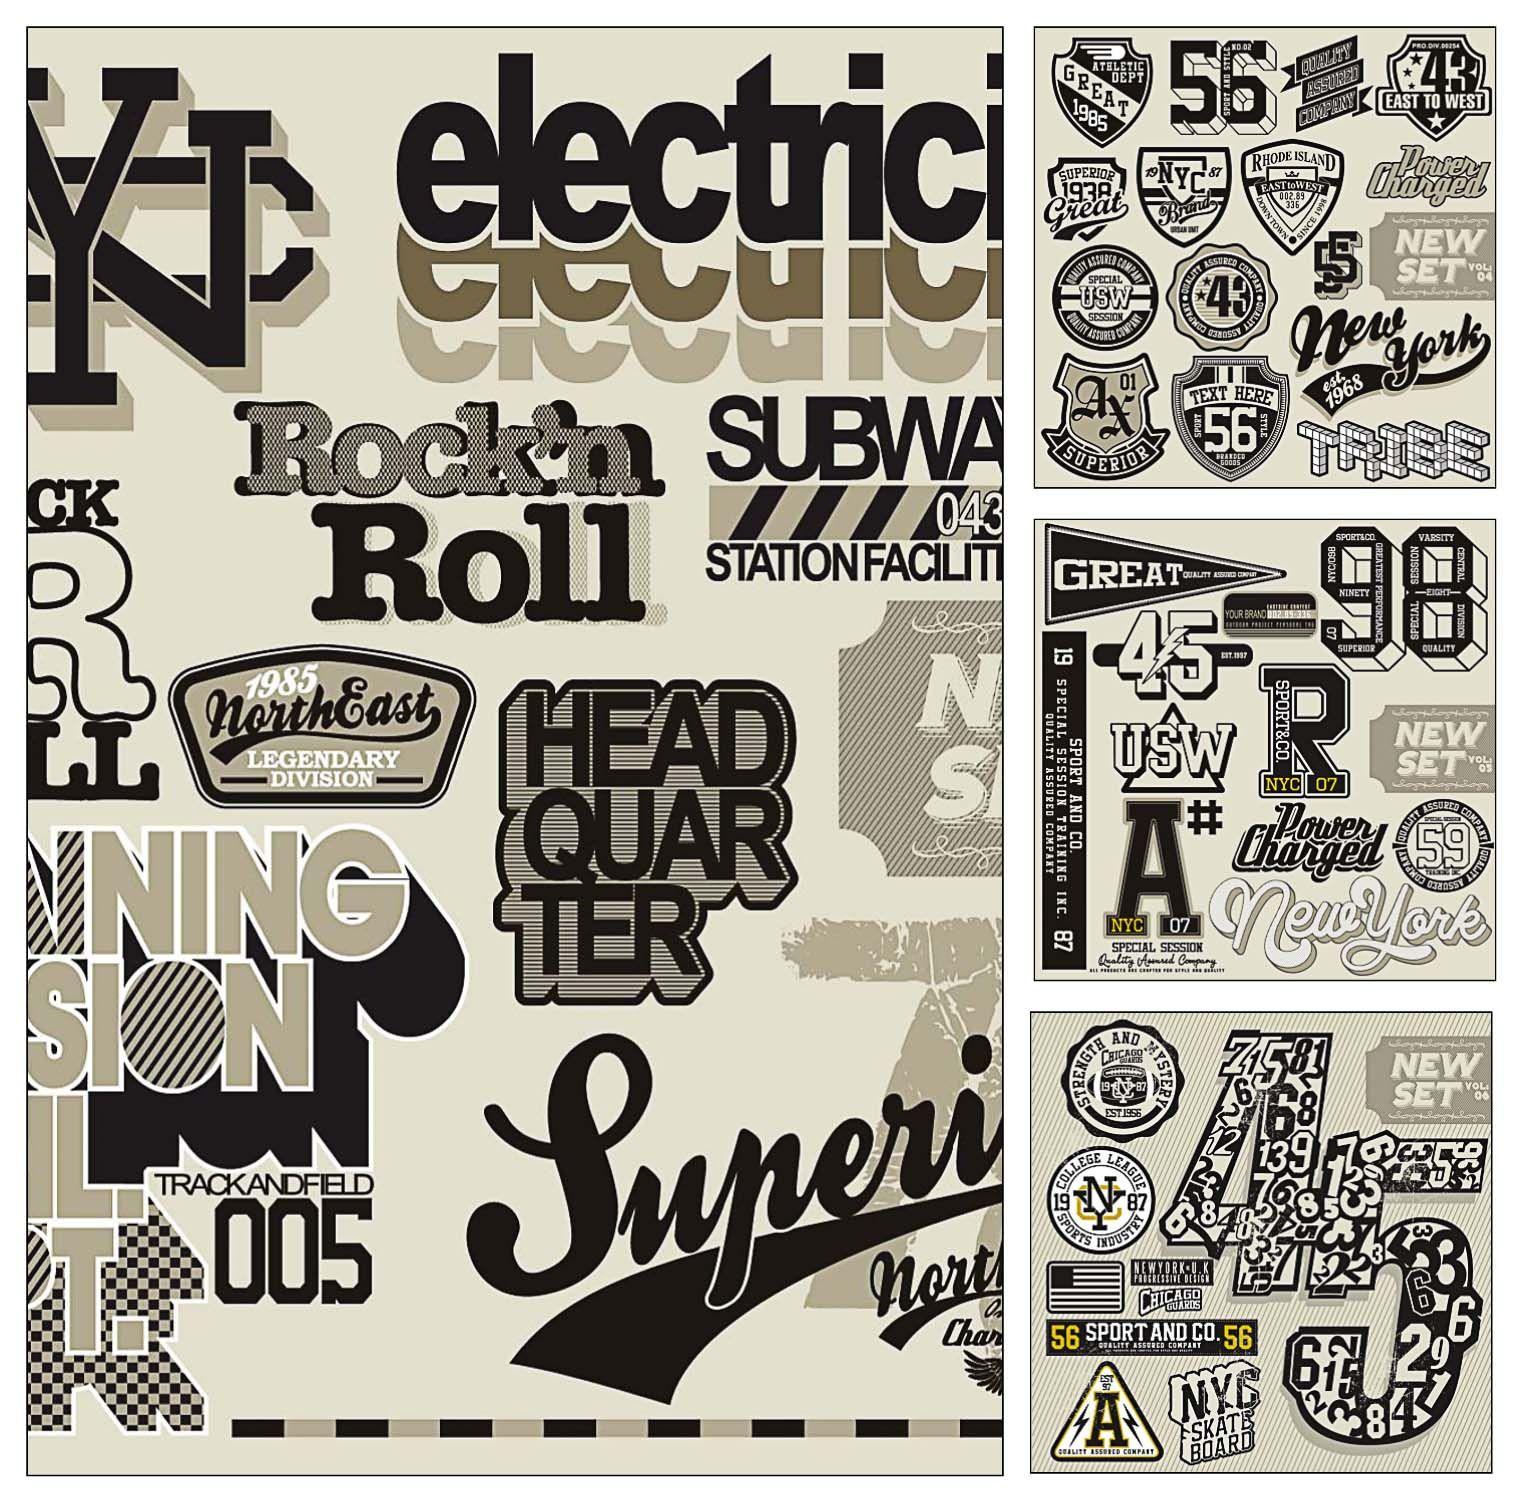 Tshirt templates logos vector Free t shirt design, T